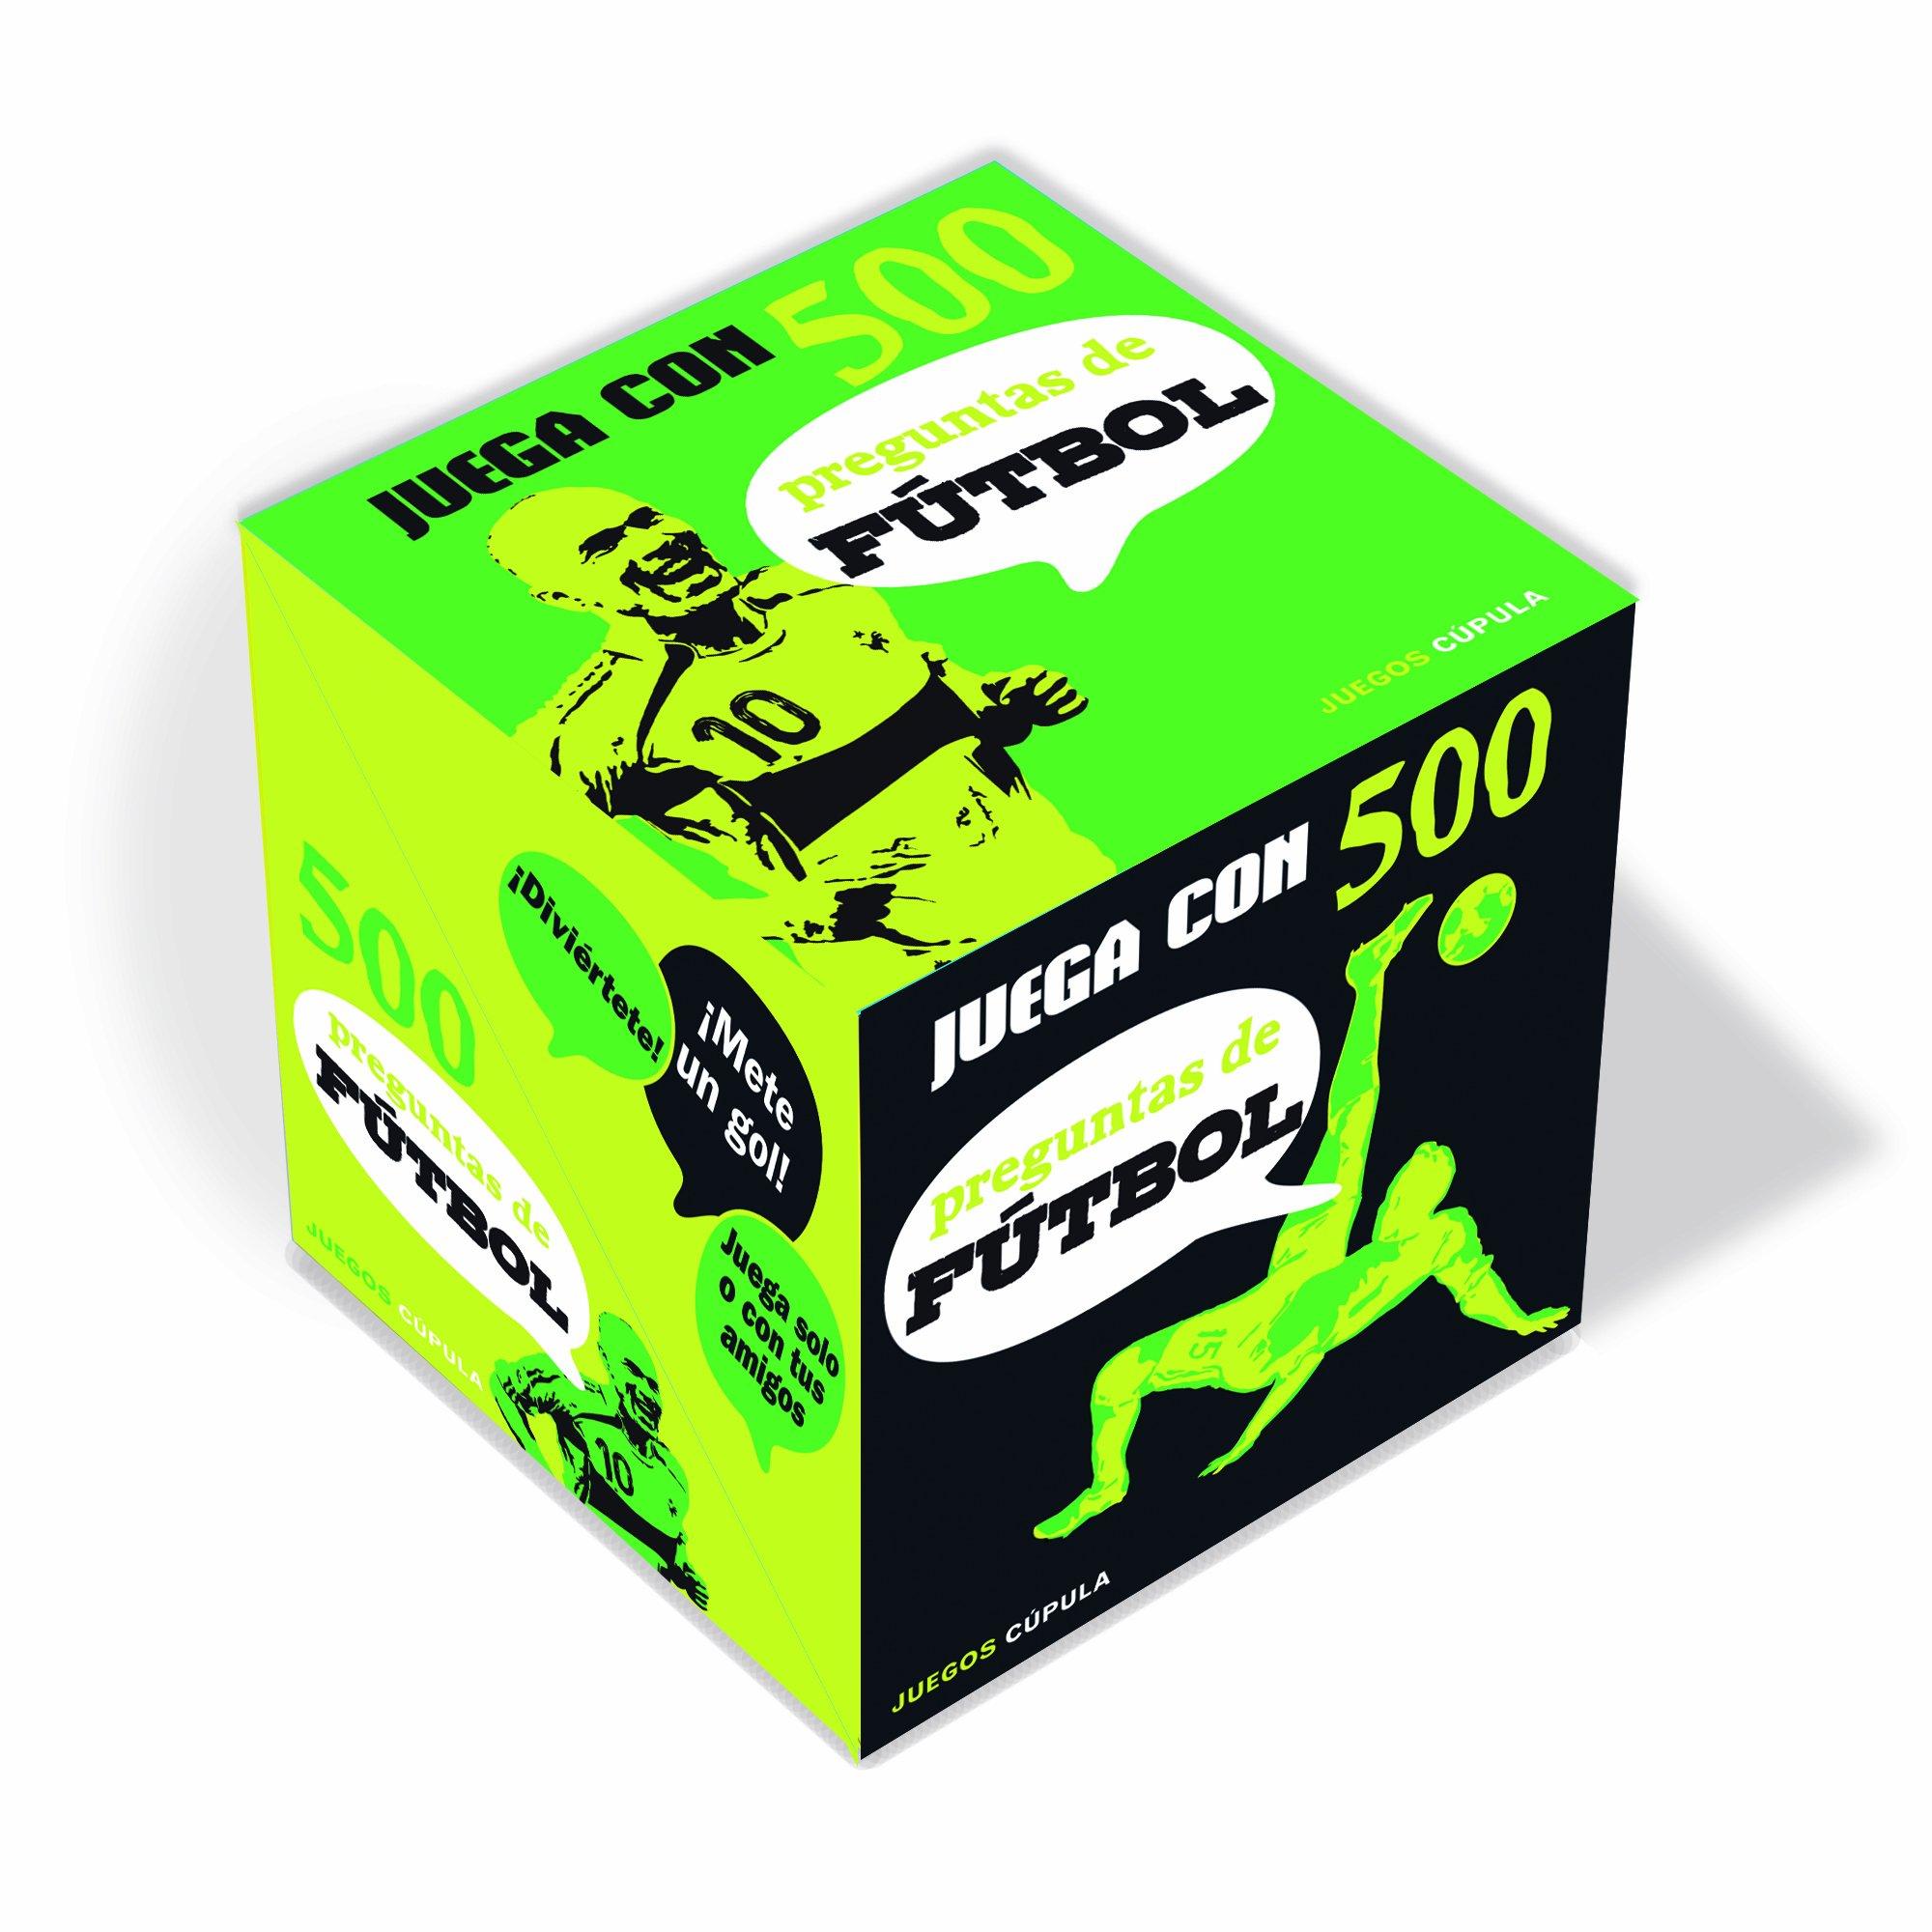 Juega con 500 preguntas de fútbol (Juegos Cúpula): Amazon.es: AA. VV., Parangona Realització Editorial S.L.: Libros